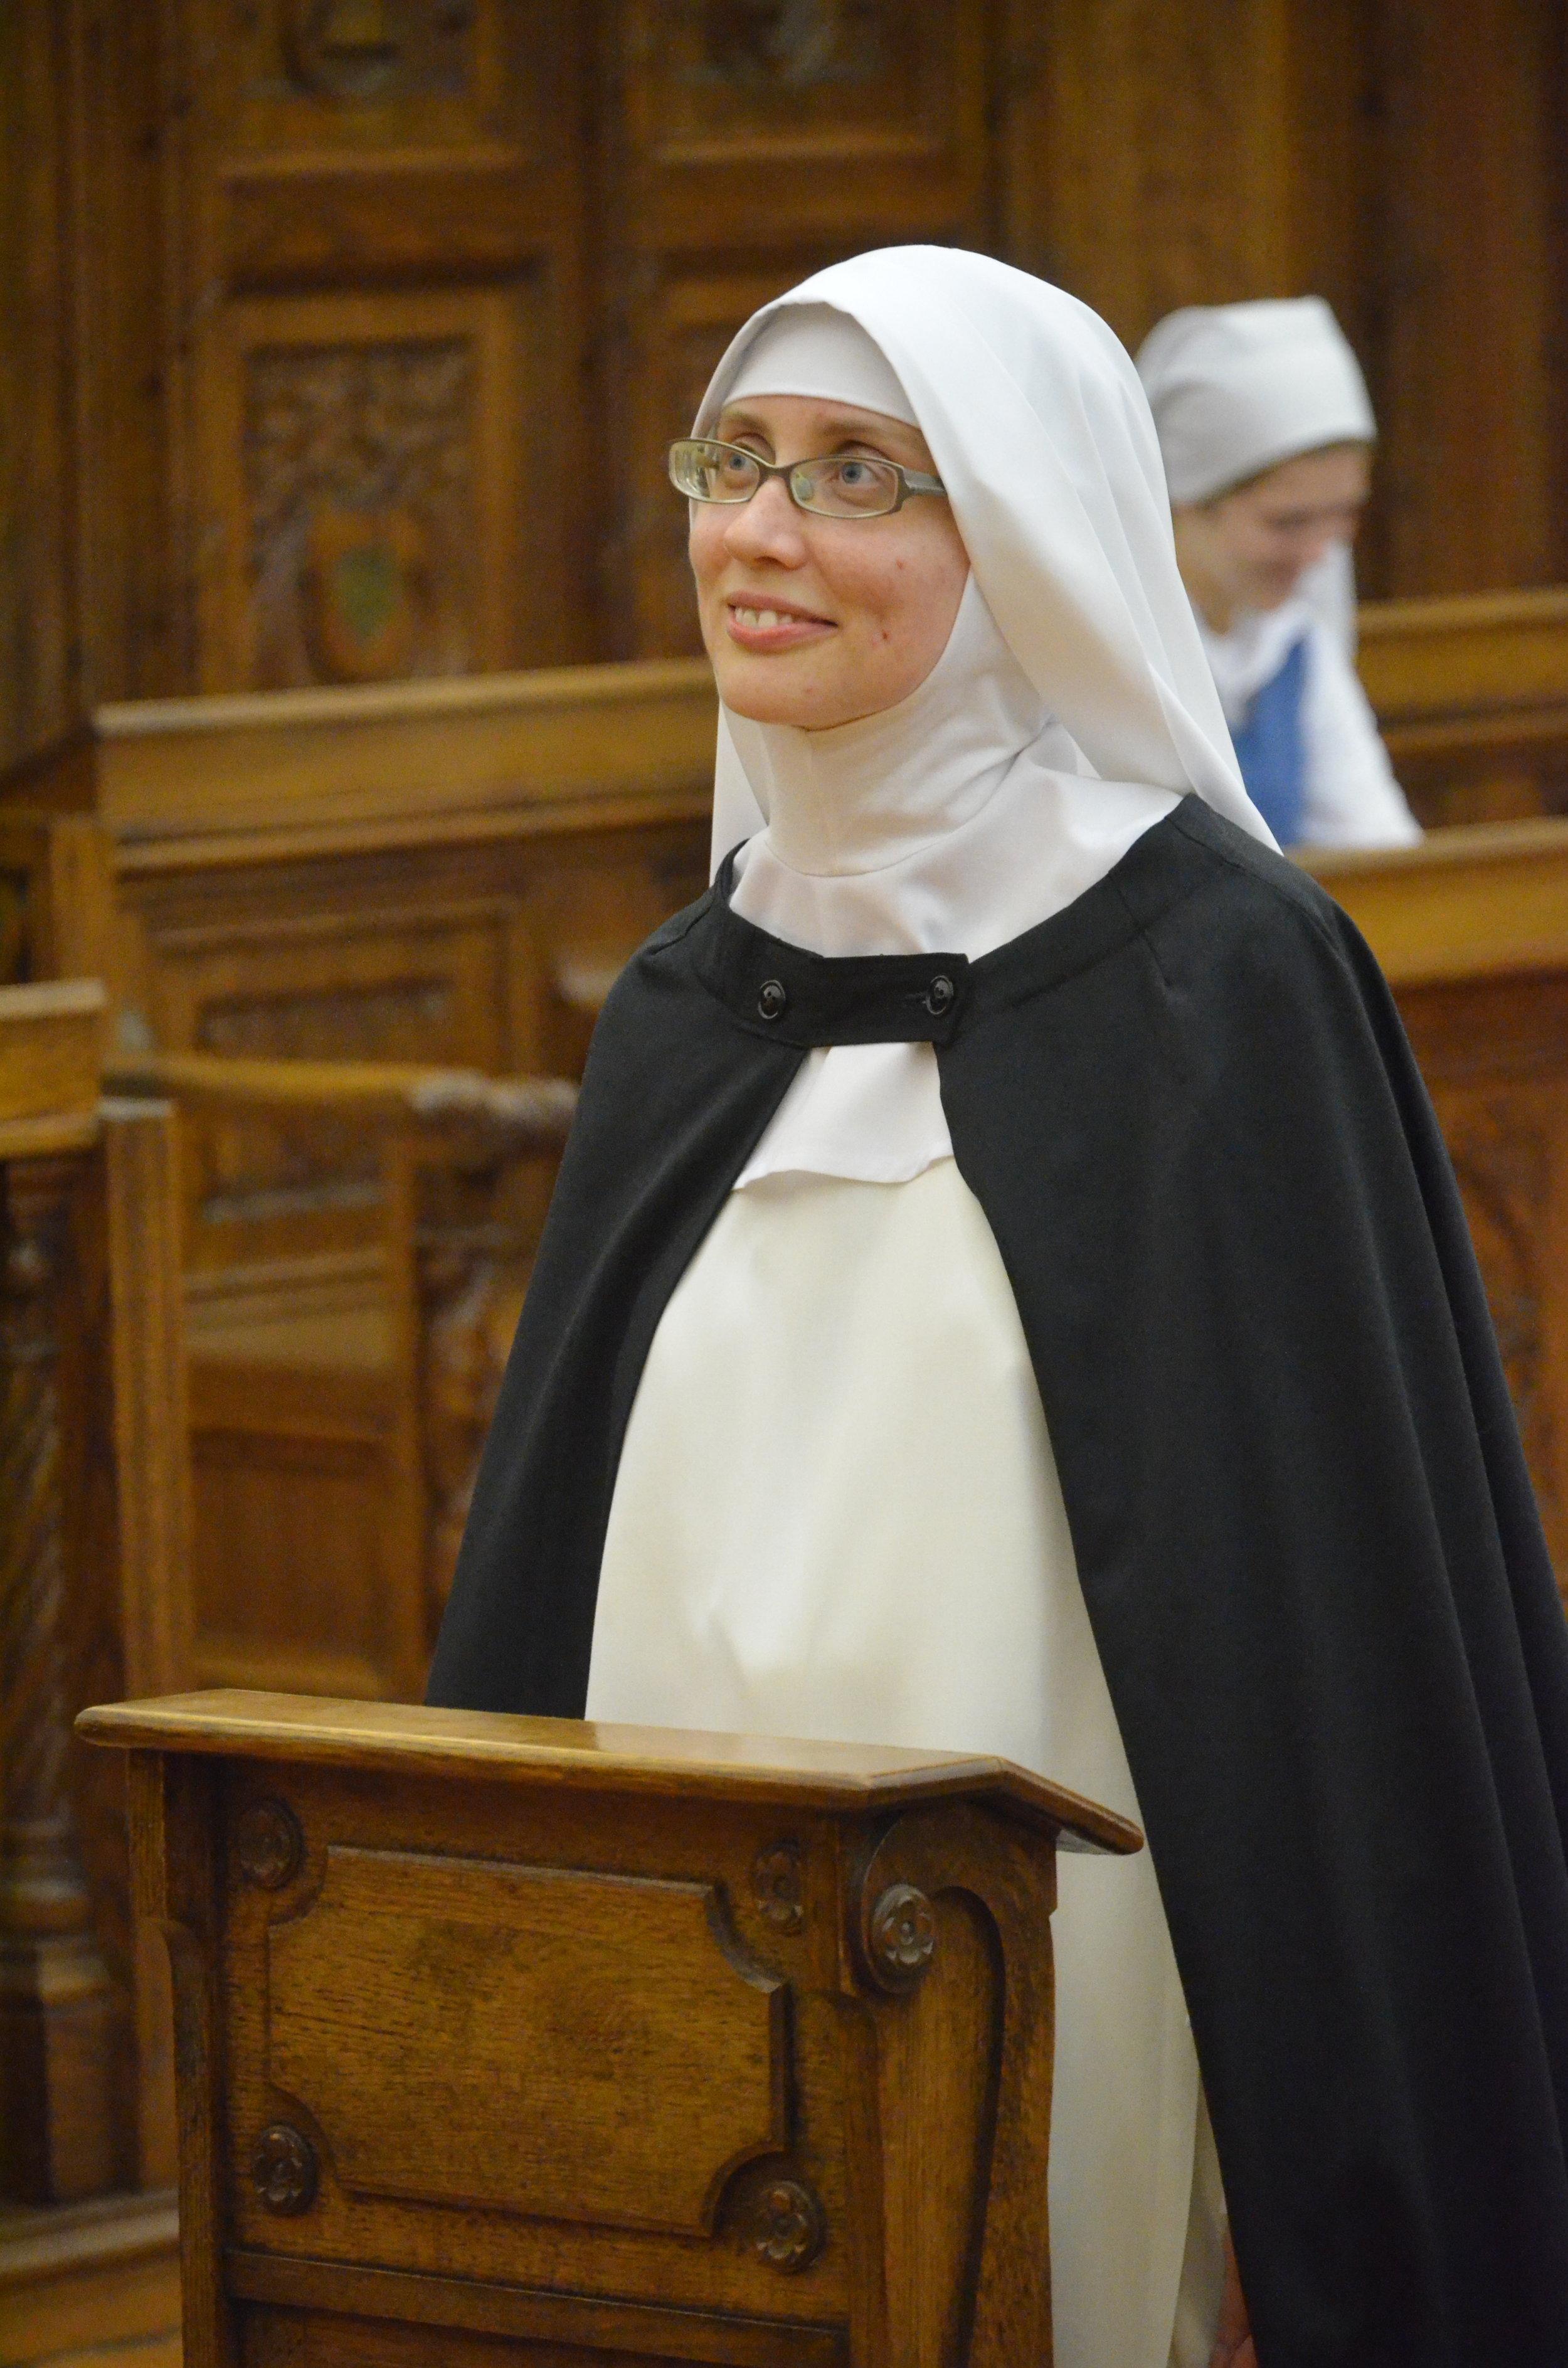 Sr. Maria Johanna's First Profession Mass